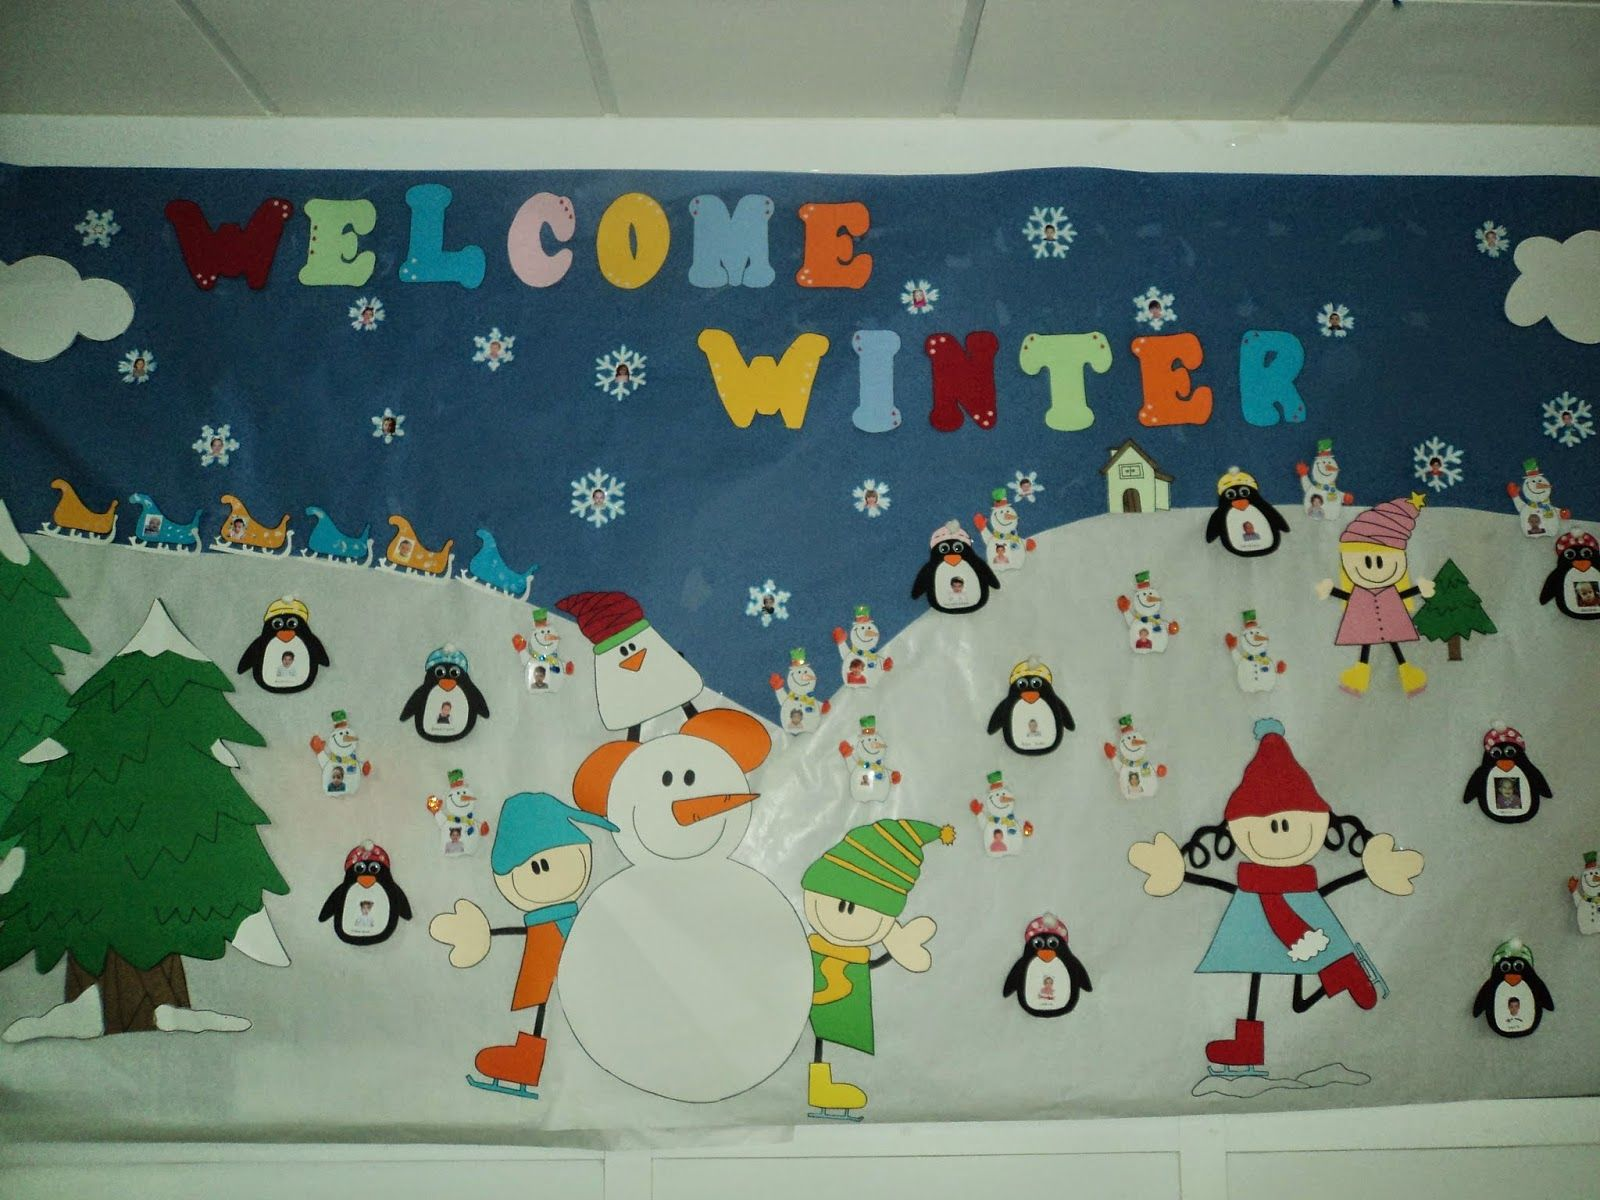 Centro de educaci n infantil almeragua mural de for Manualidades decoracion infantil